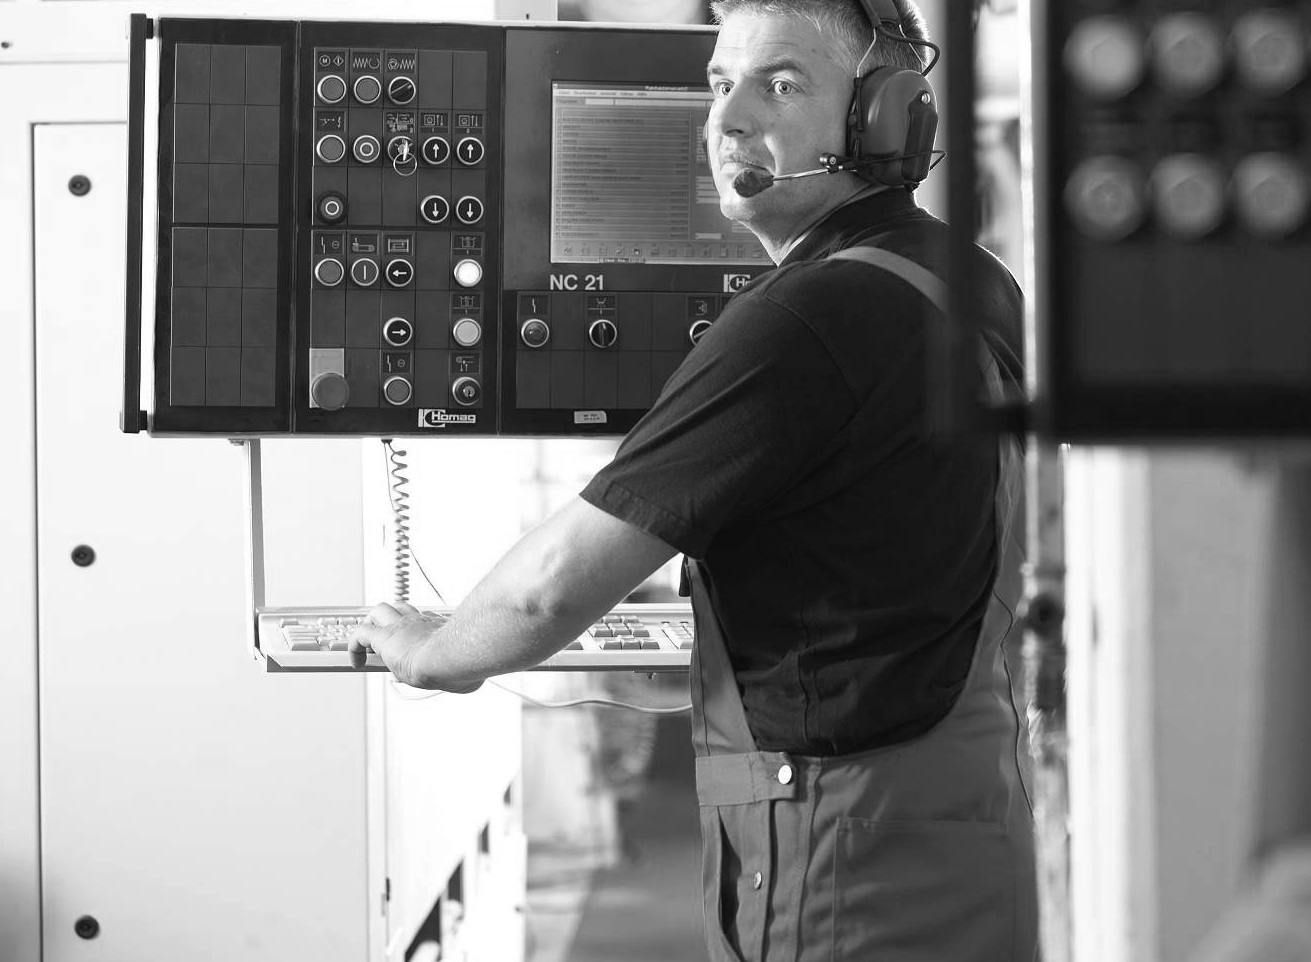 Qualità di prim'ordine SieMatic grazie a laboratori di controlli propri e a verifiche interne ed esterne per la garanzia di qualità.